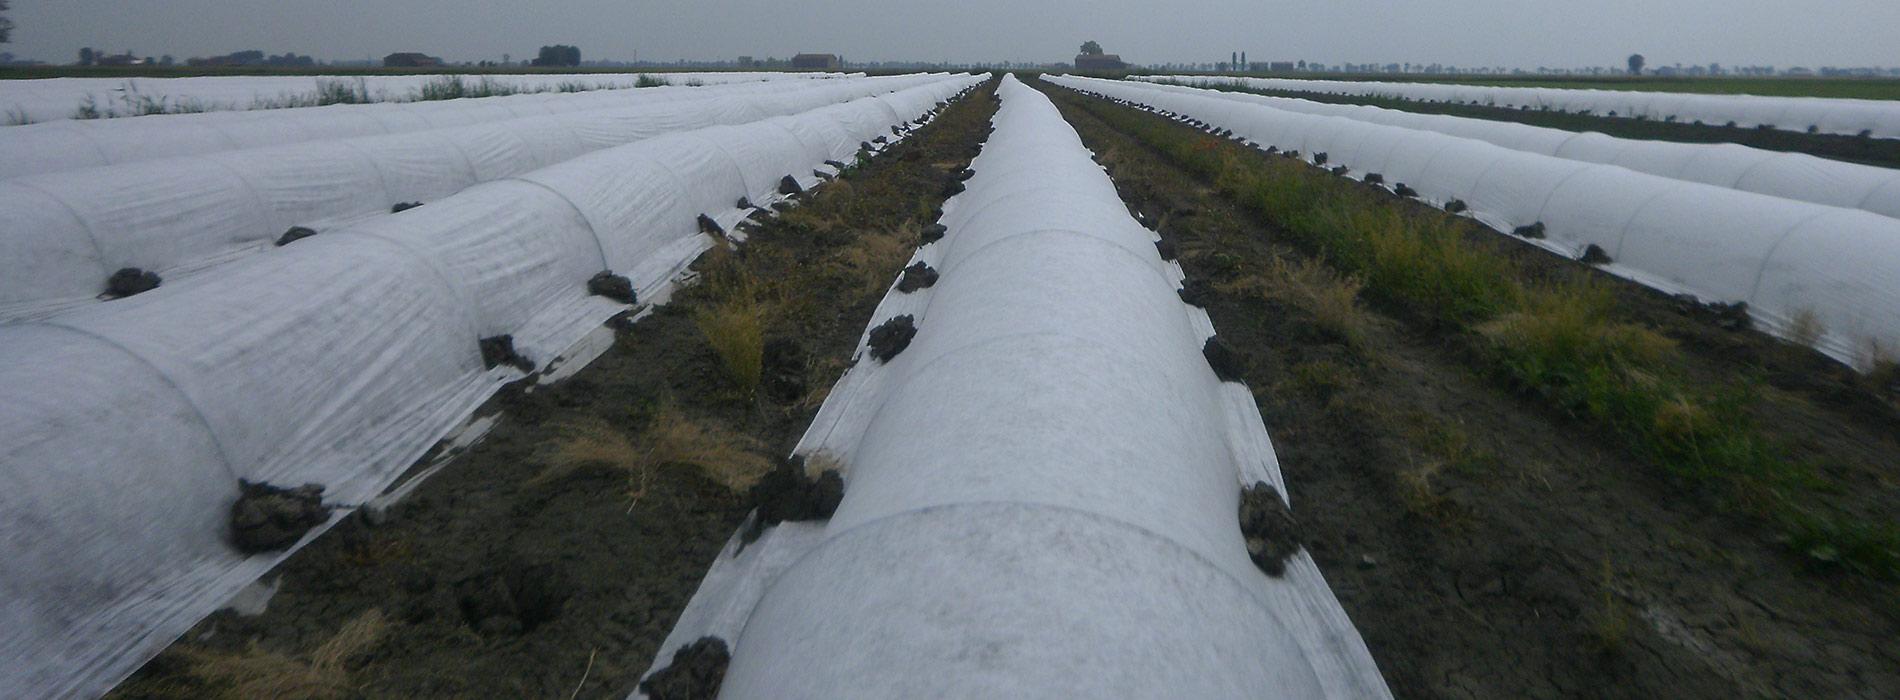 tessuto non tessuto per uso agricolo